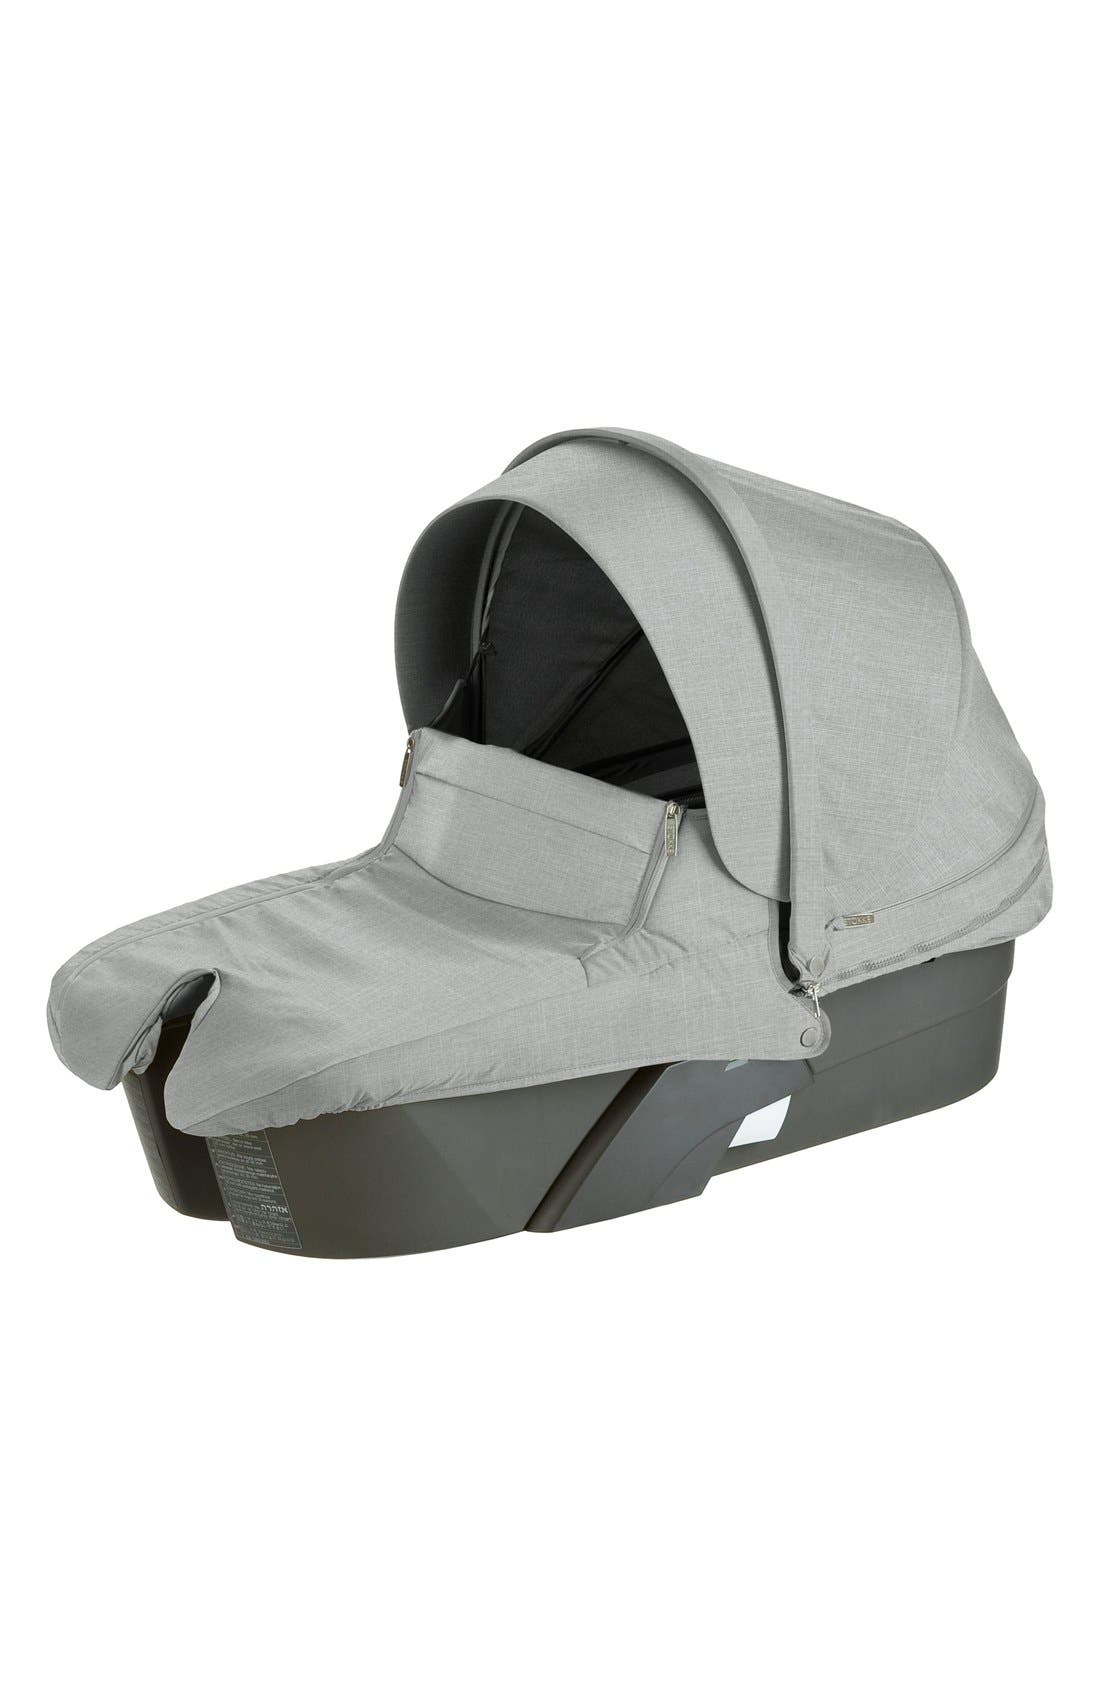 'Xplory<sup>®</sup>' Stroller Carry Cot,                             Main thumbnail 1, color,                             051